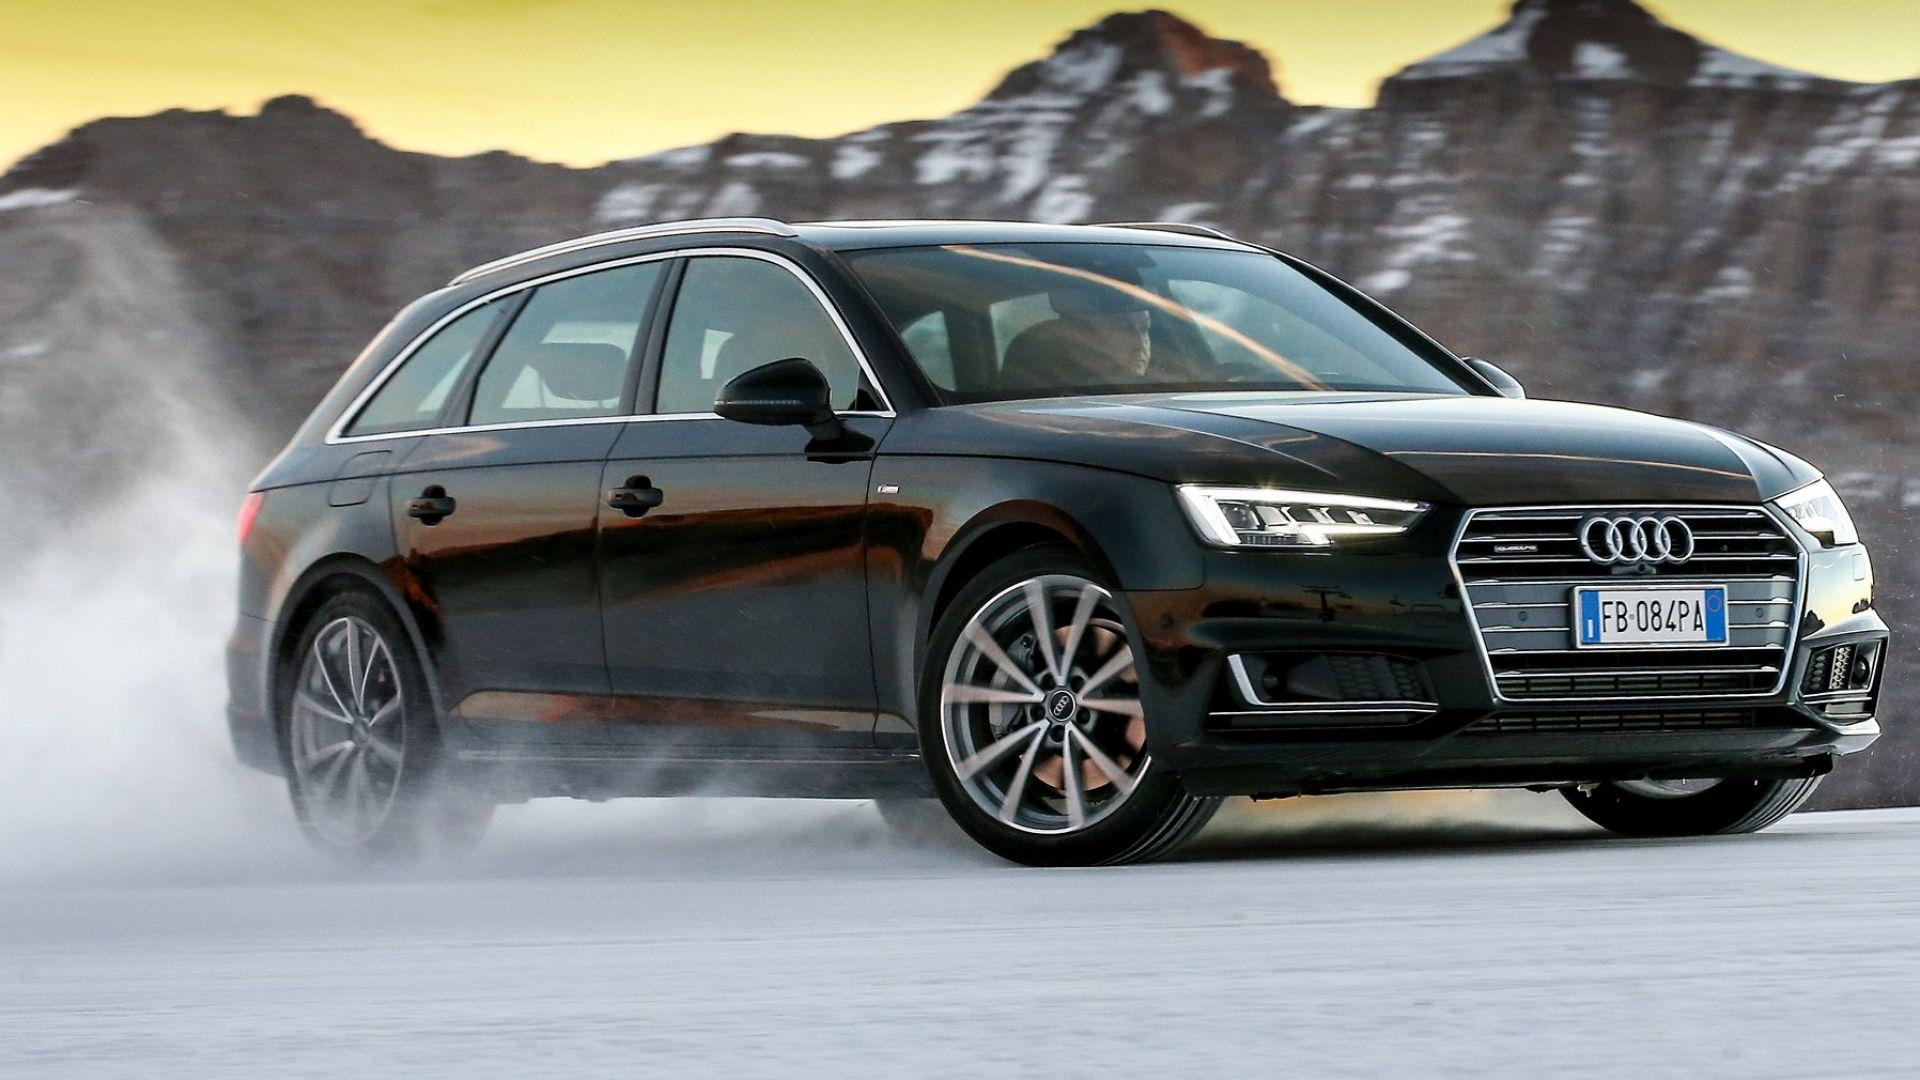 Audi Sport Quattro >> Prova su strada: Audi A4 Avant 2.0 TDI 190 cv S tronic